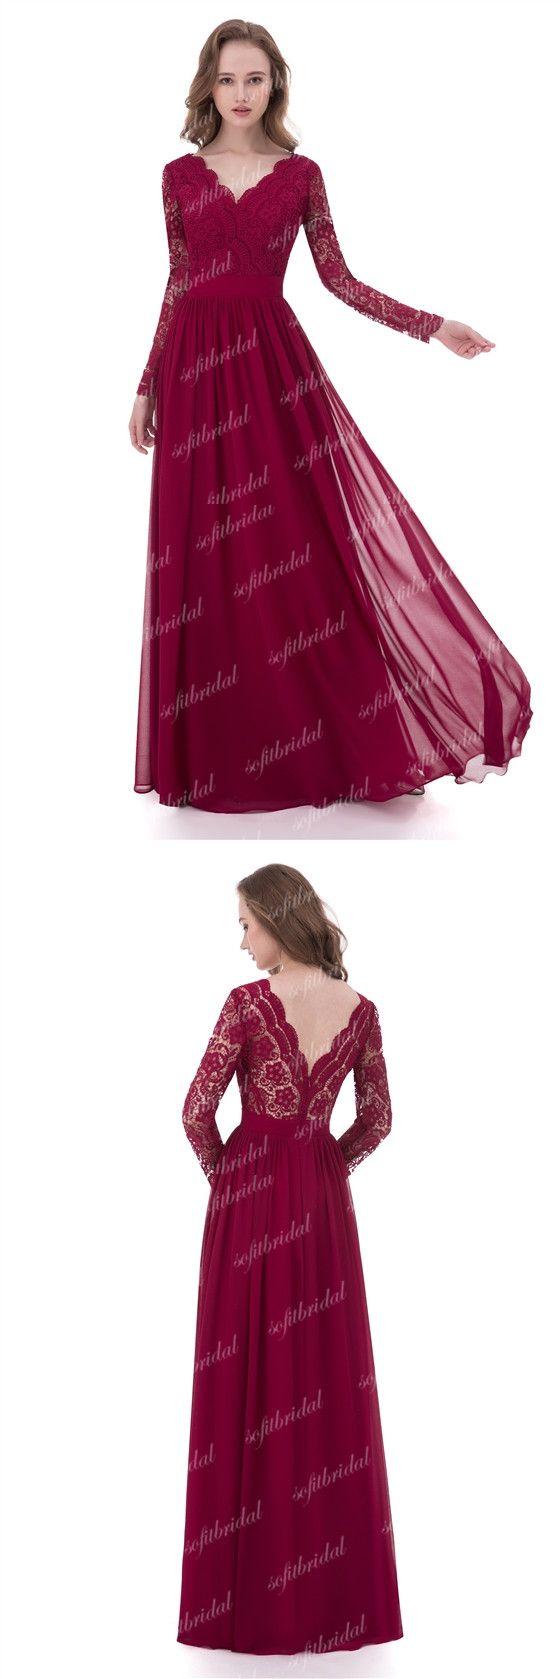 V-neck Long Sleeve Lace Chiffon Long A-line Bridesmaid Dresses, Wedding Guest Dresses, PD0334 #sofitbridal #bridesmaiddresses #weddings